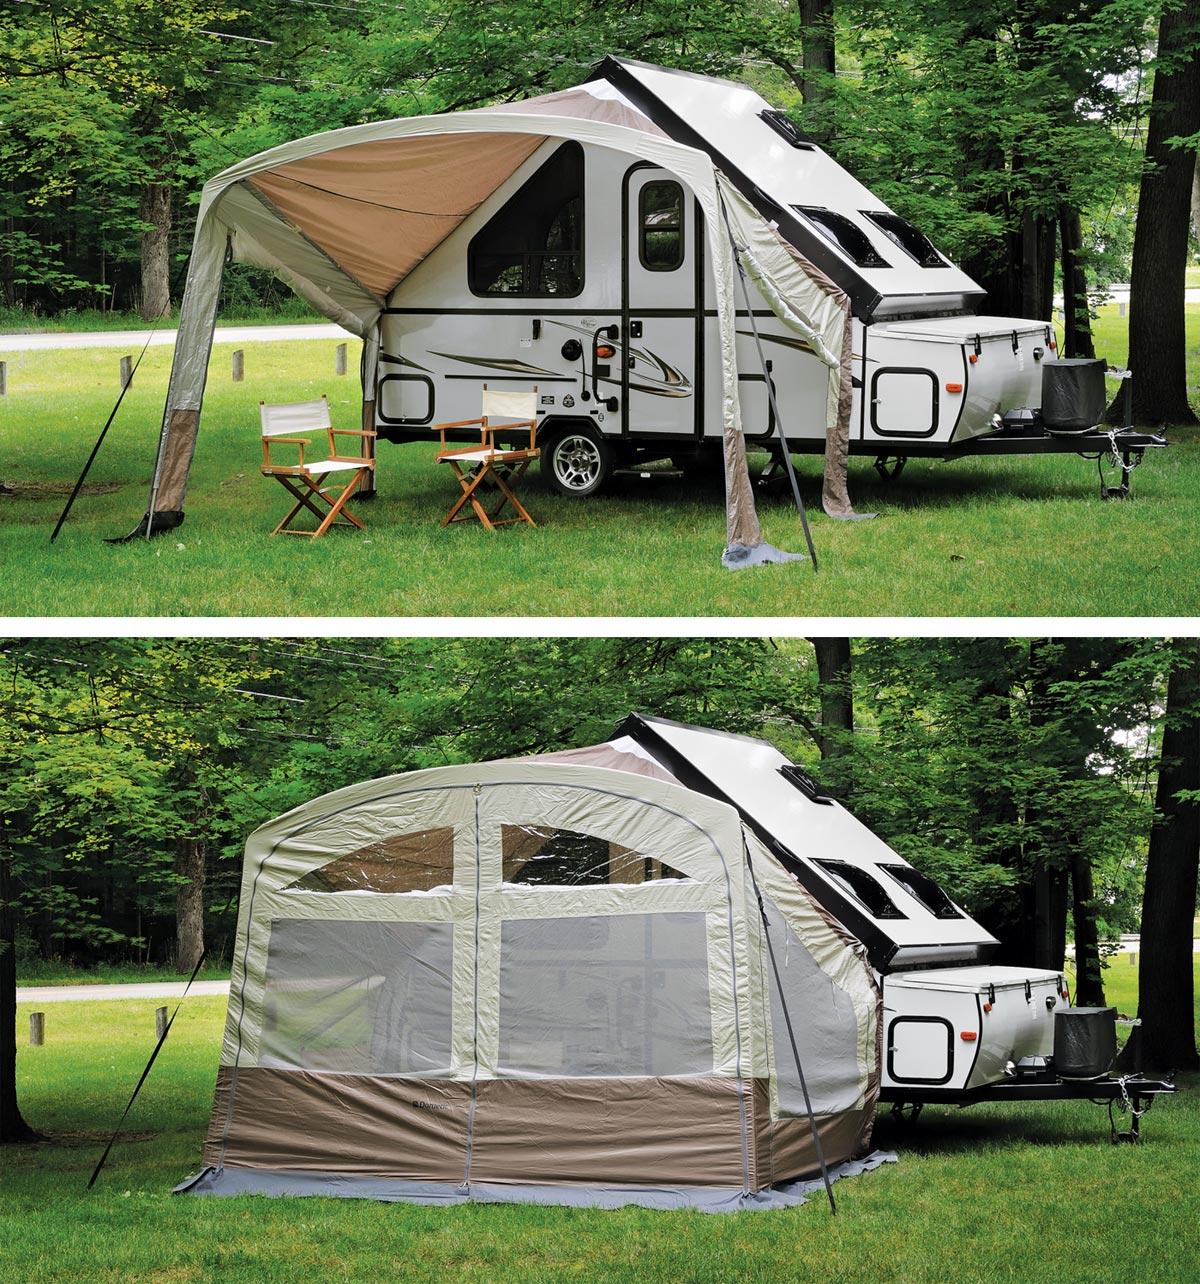 Excellent Flagstaff Camping Trailers A Frame Camper Combo Combo Details Bathroom A Frame Camper Bunk Beds curbed A Frame Camper